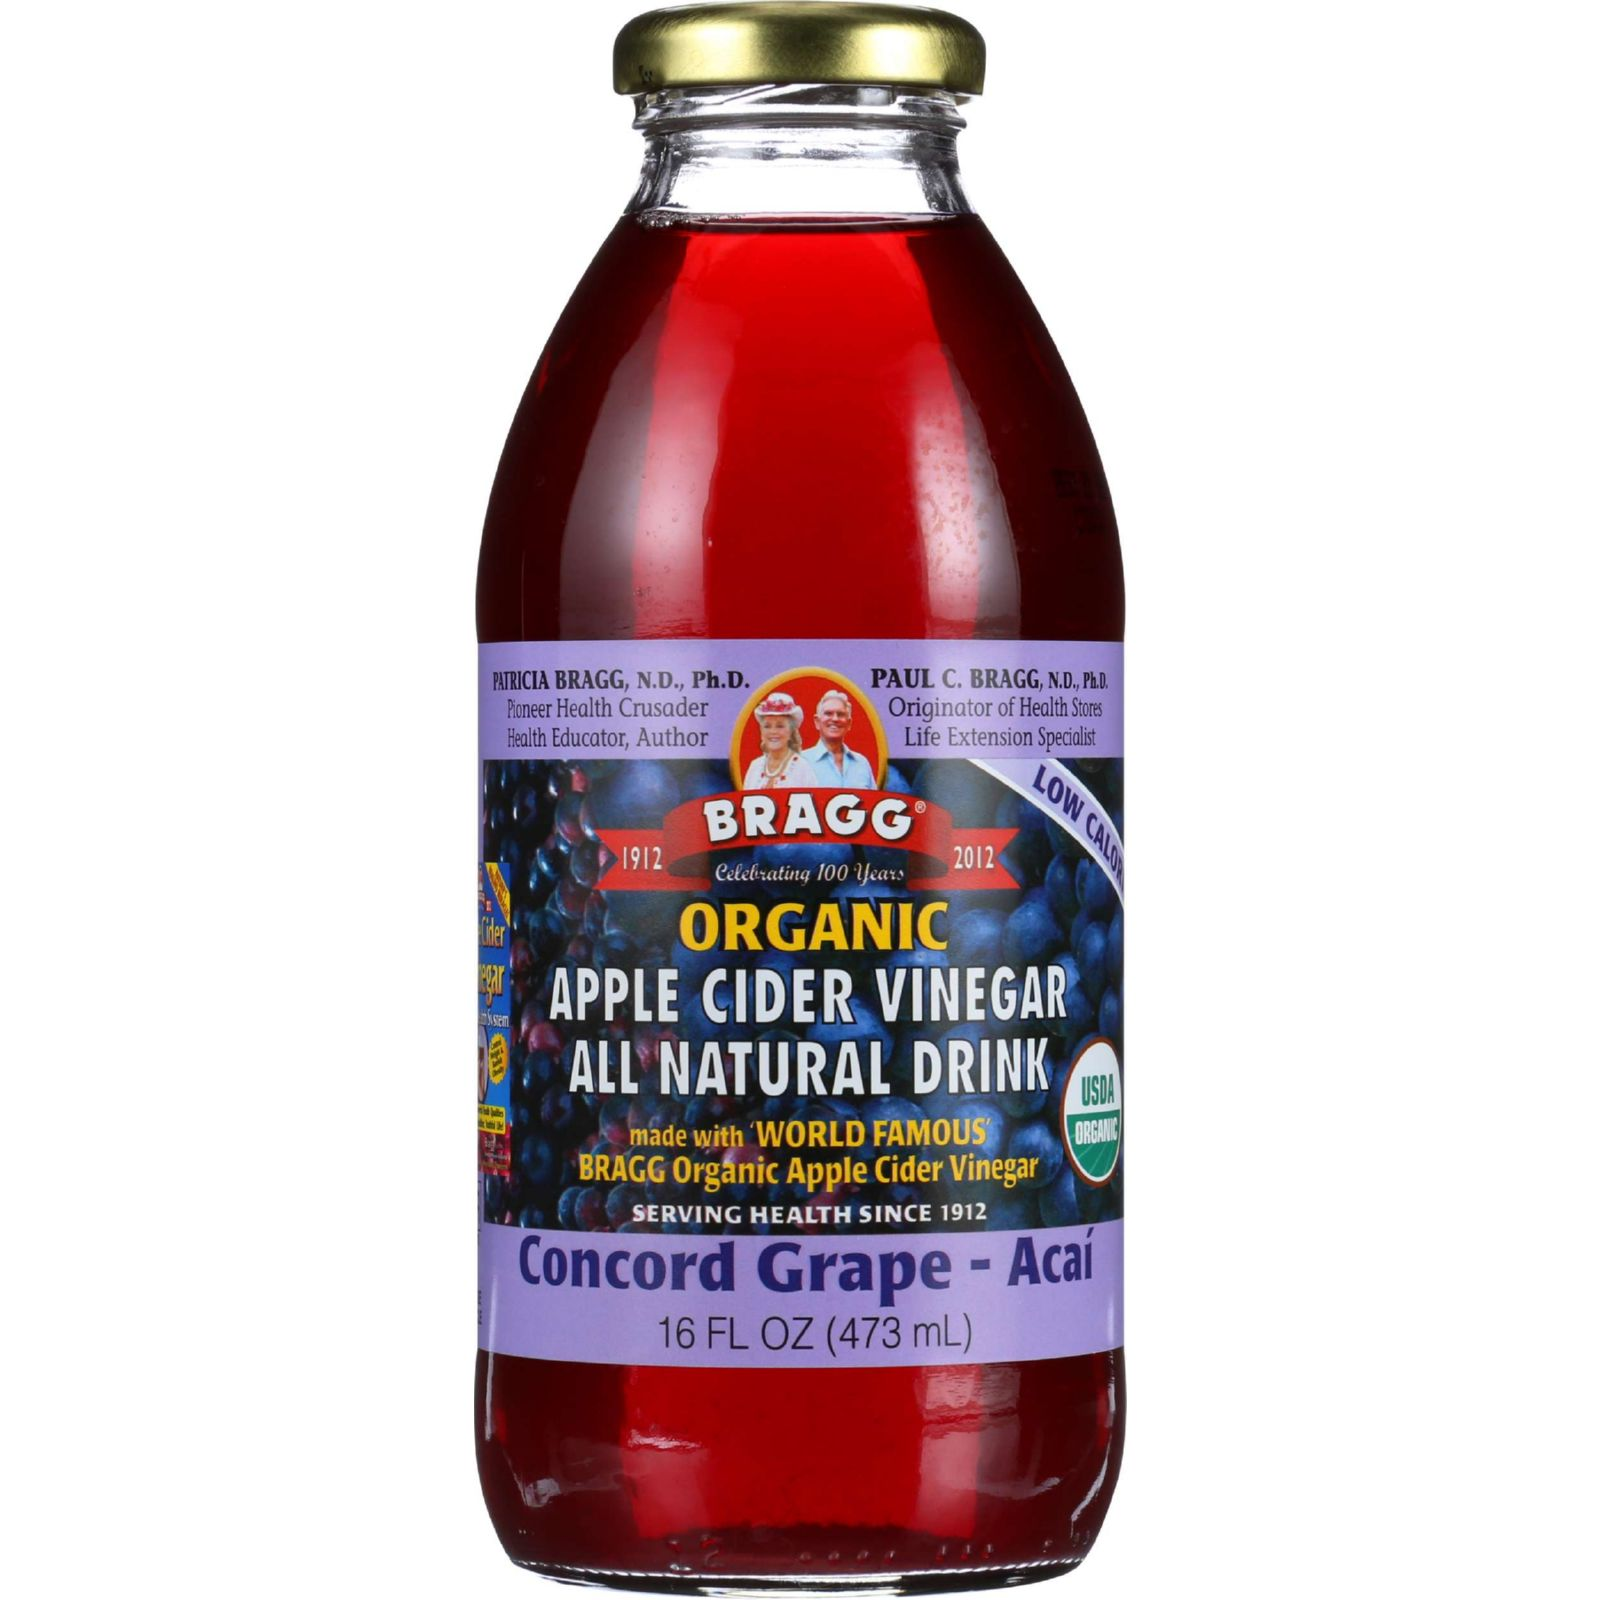 Bragg Apple Cider Vinegar Drink Organic Concord Grape-Acai 16 oz case of 12 by